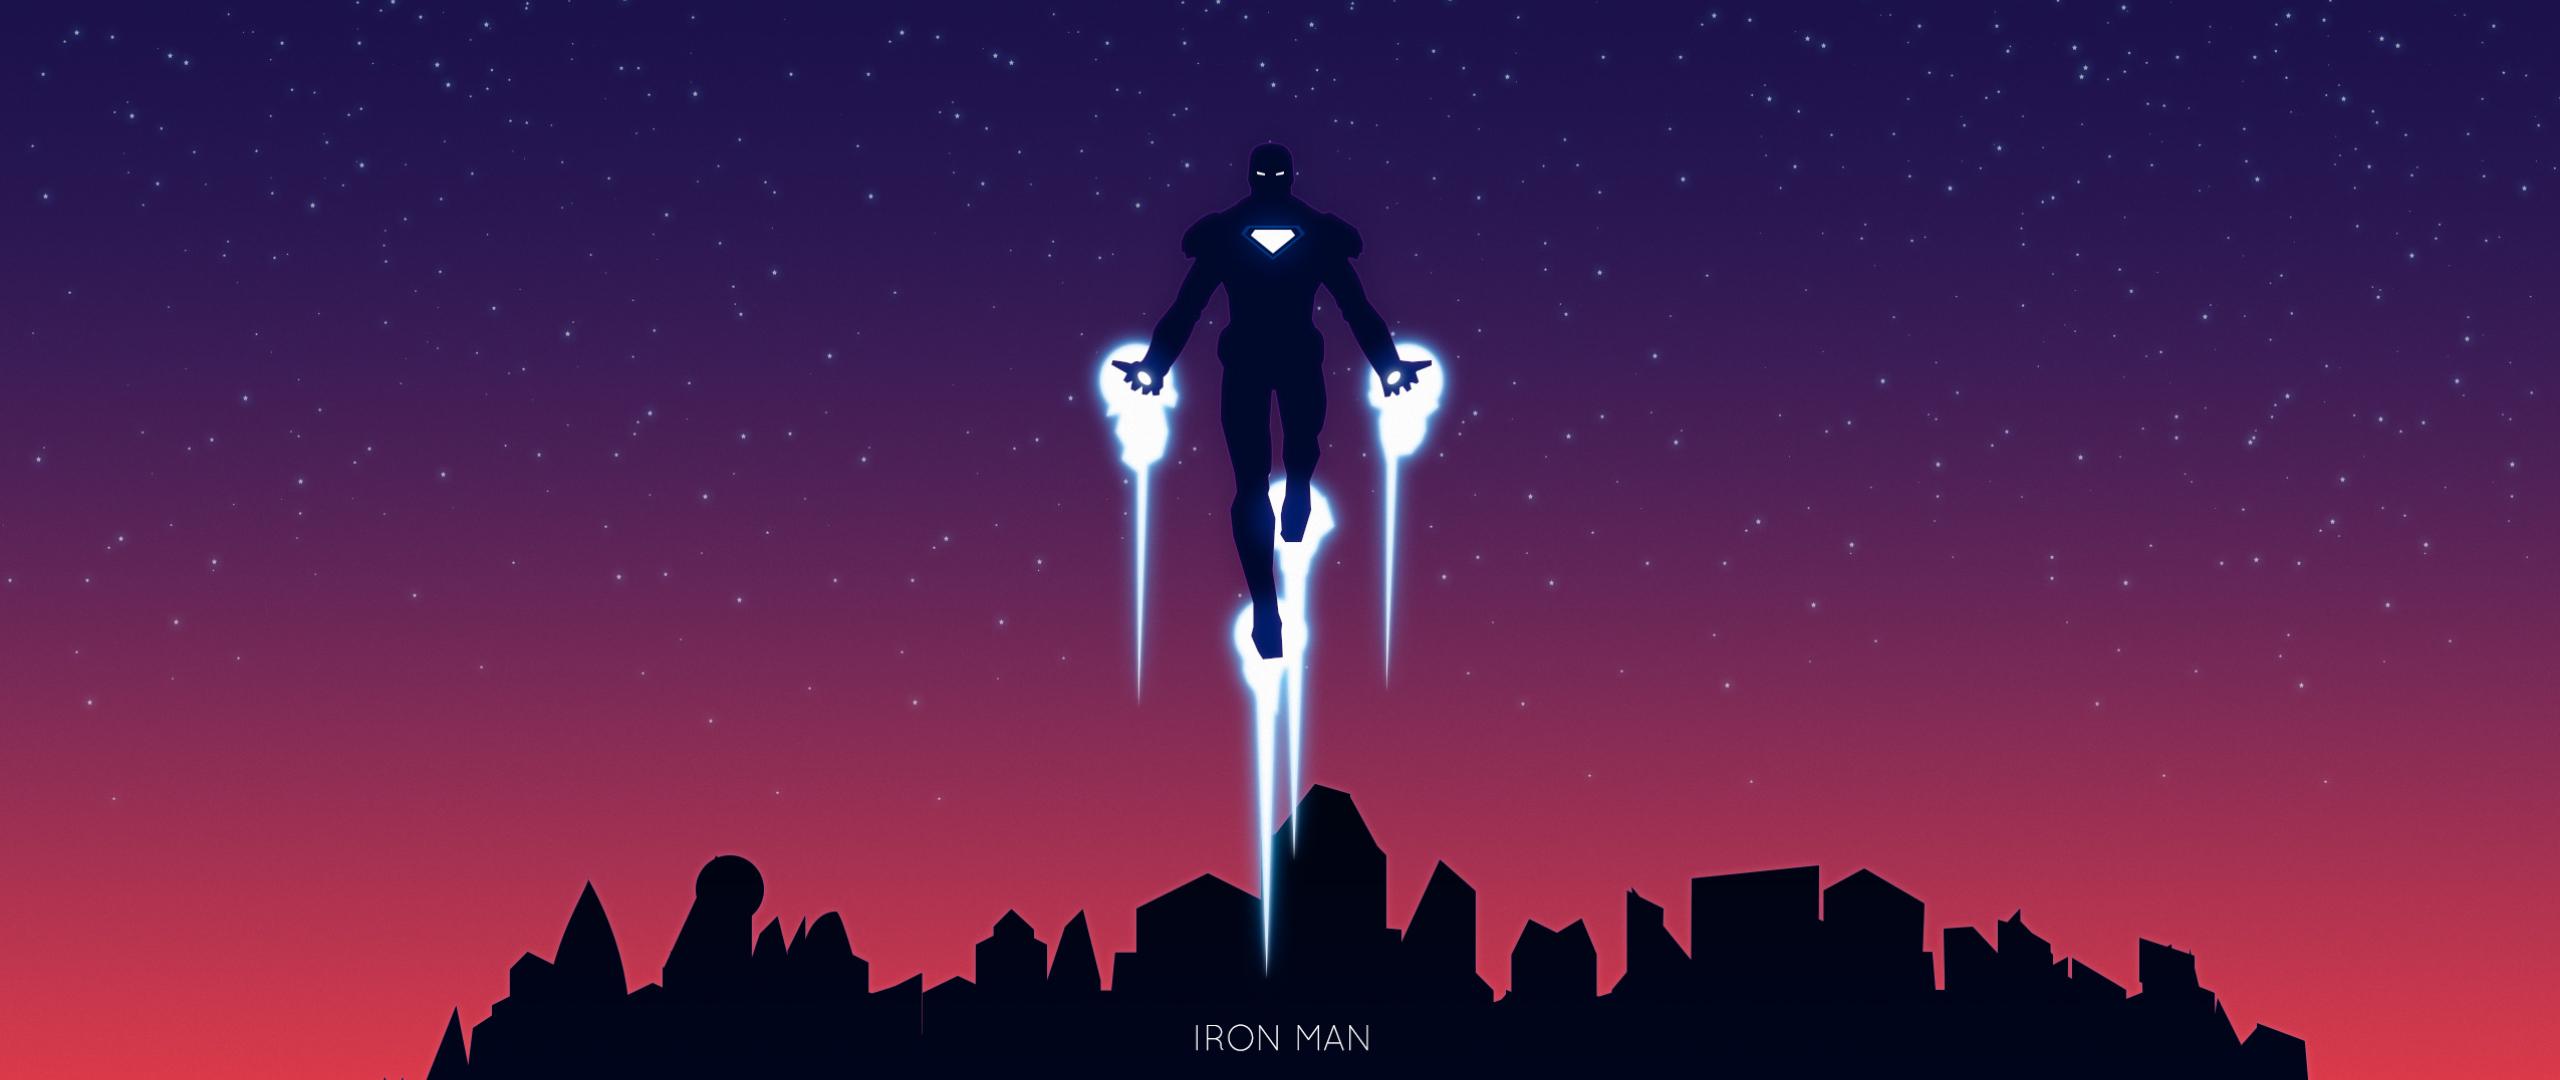 Download Iron Man Minimalism 2 2560x1080 Resolution, Full ...